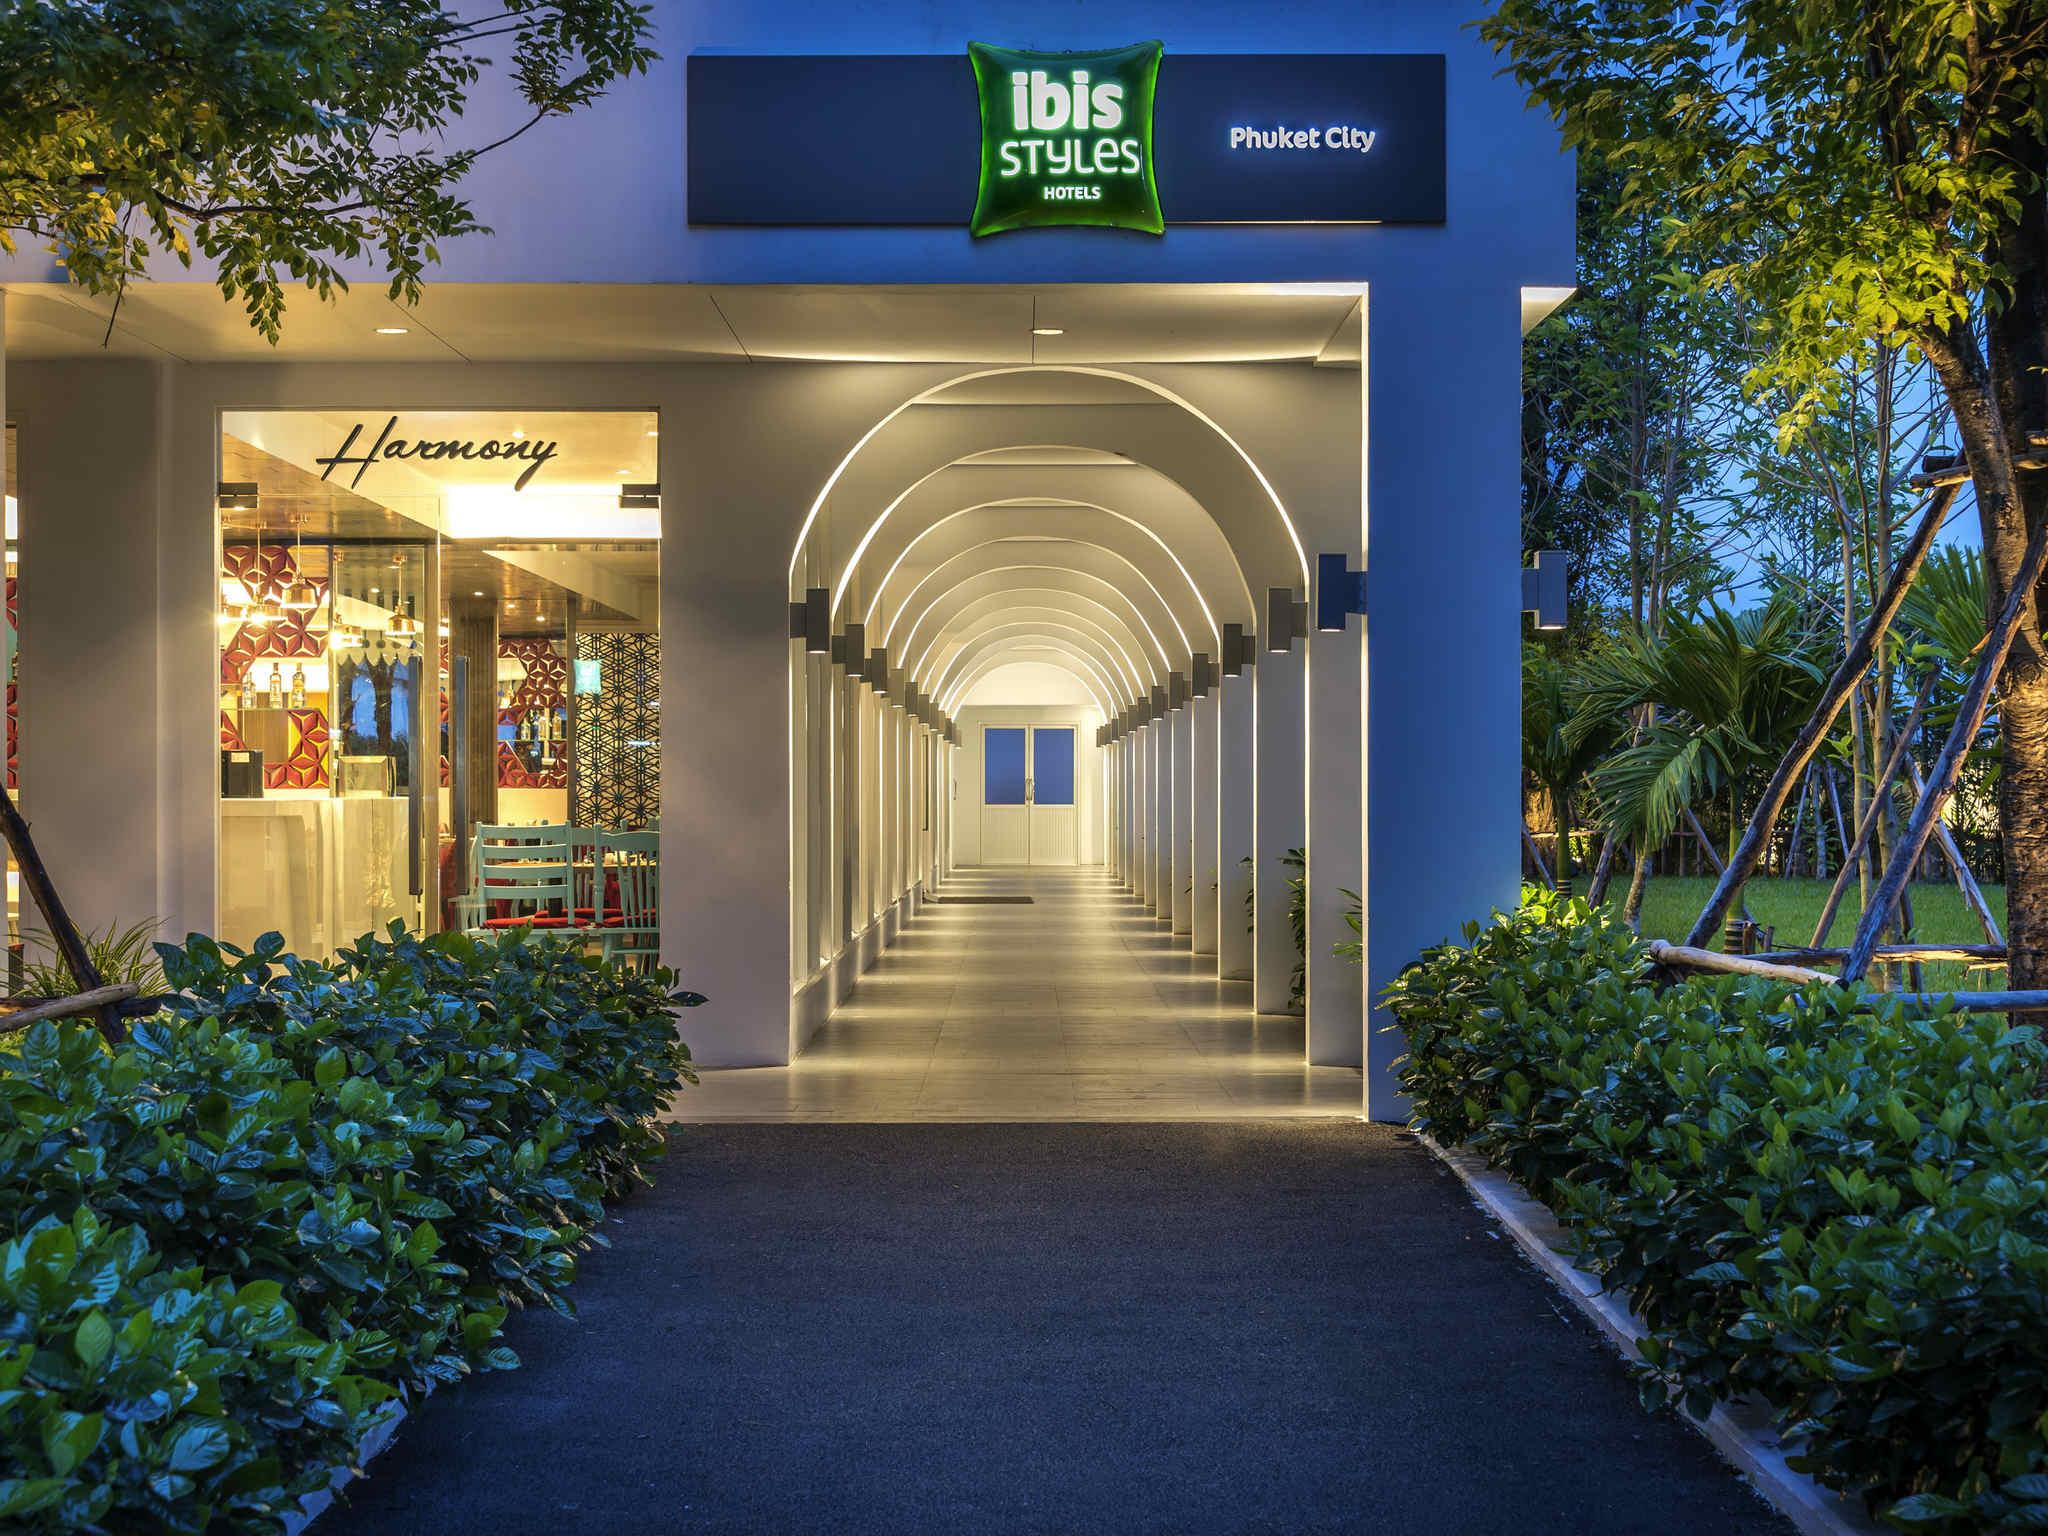 Hôtel - ibis Styles Phuket City